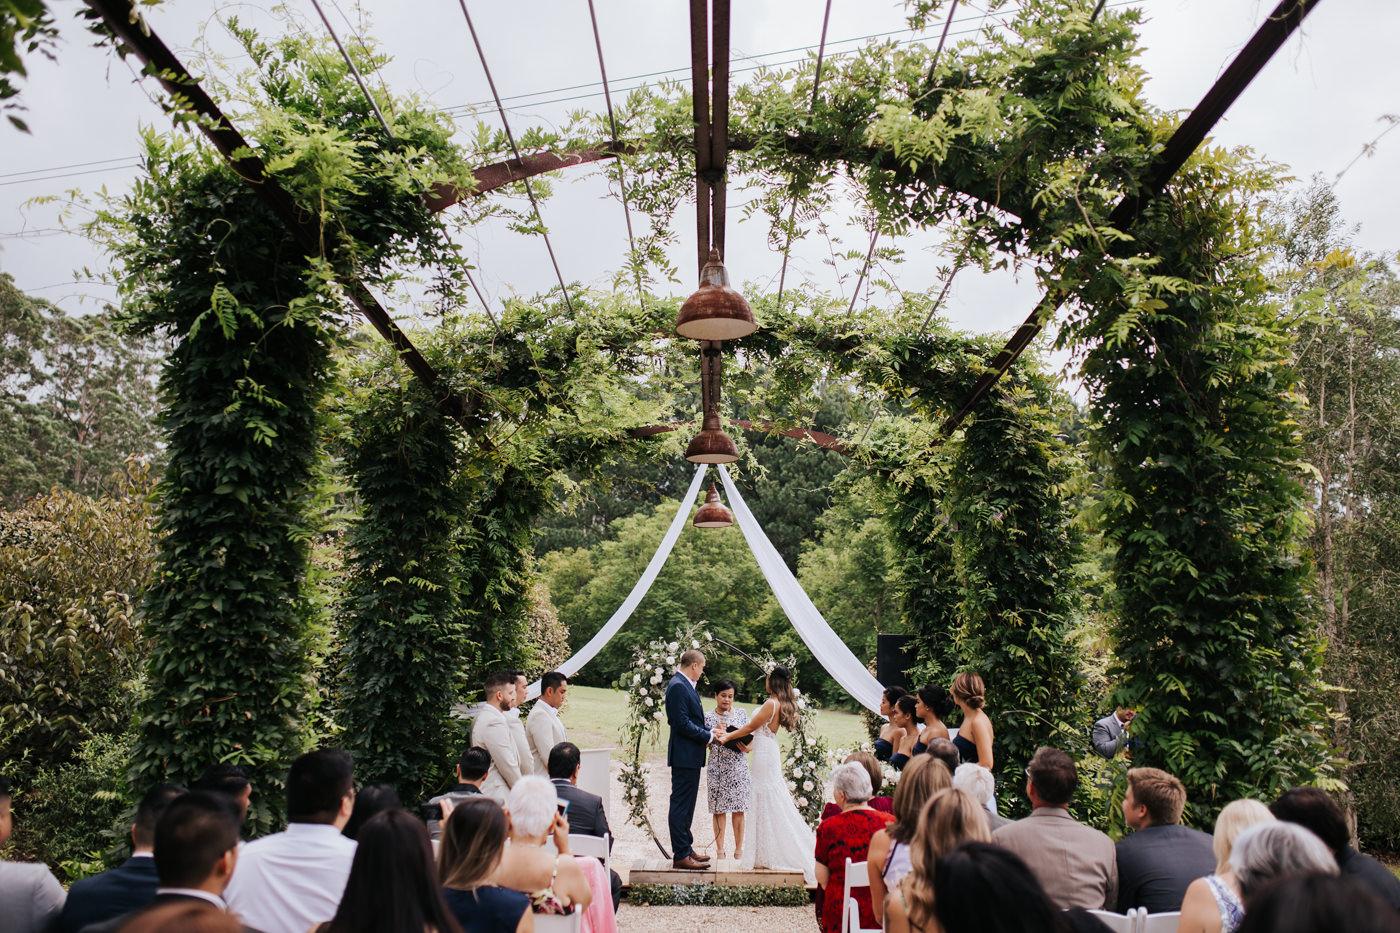 Nick & Vanezza - Fernbank Farm Wedding - Samantha Heather Photography-64.jpg